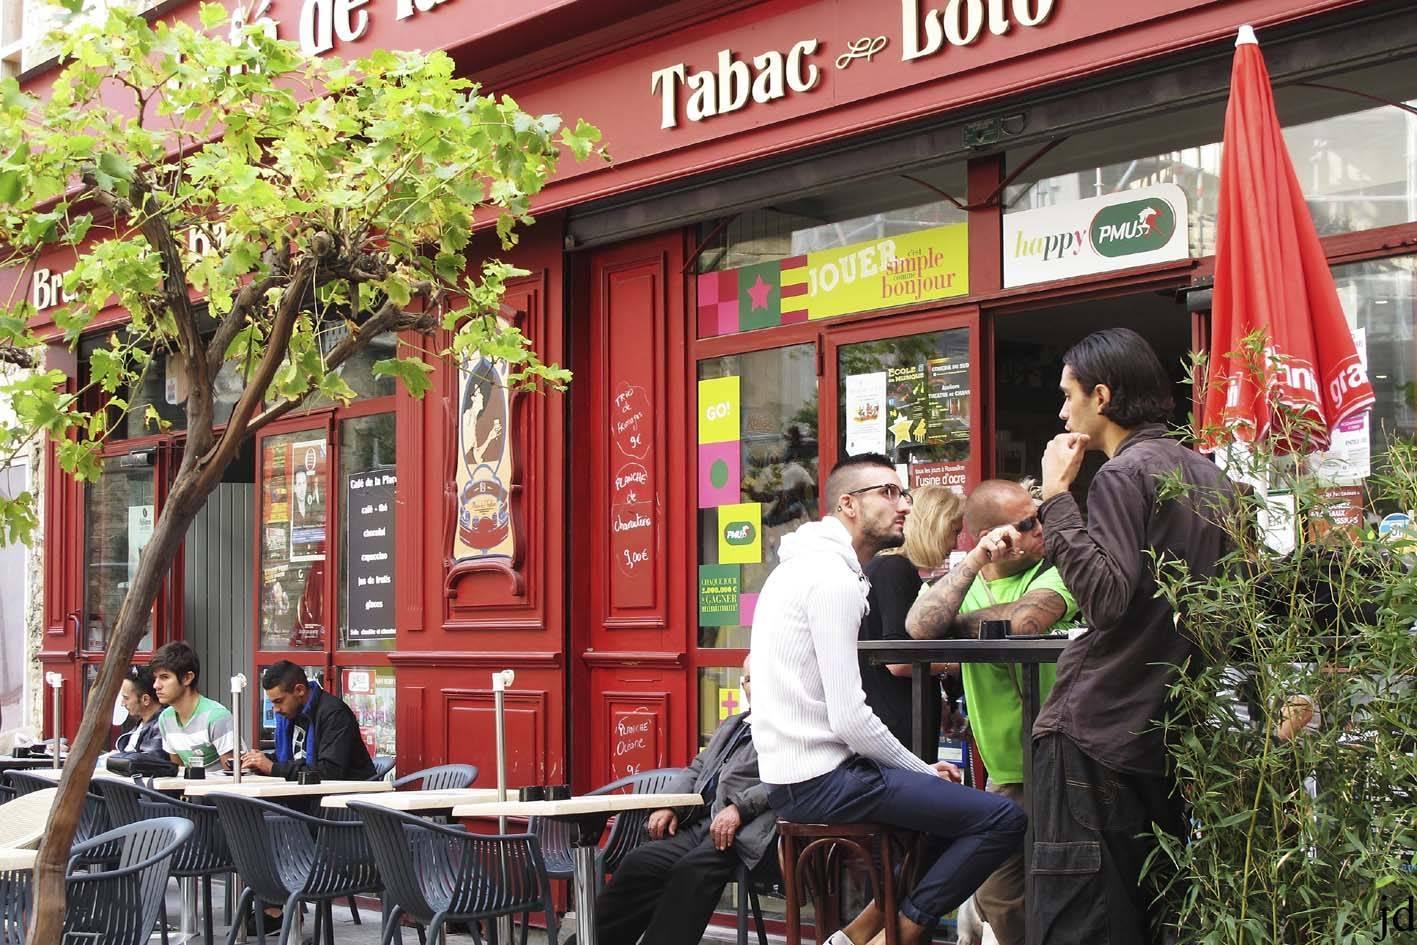 Cafe-rouge-islsorgue